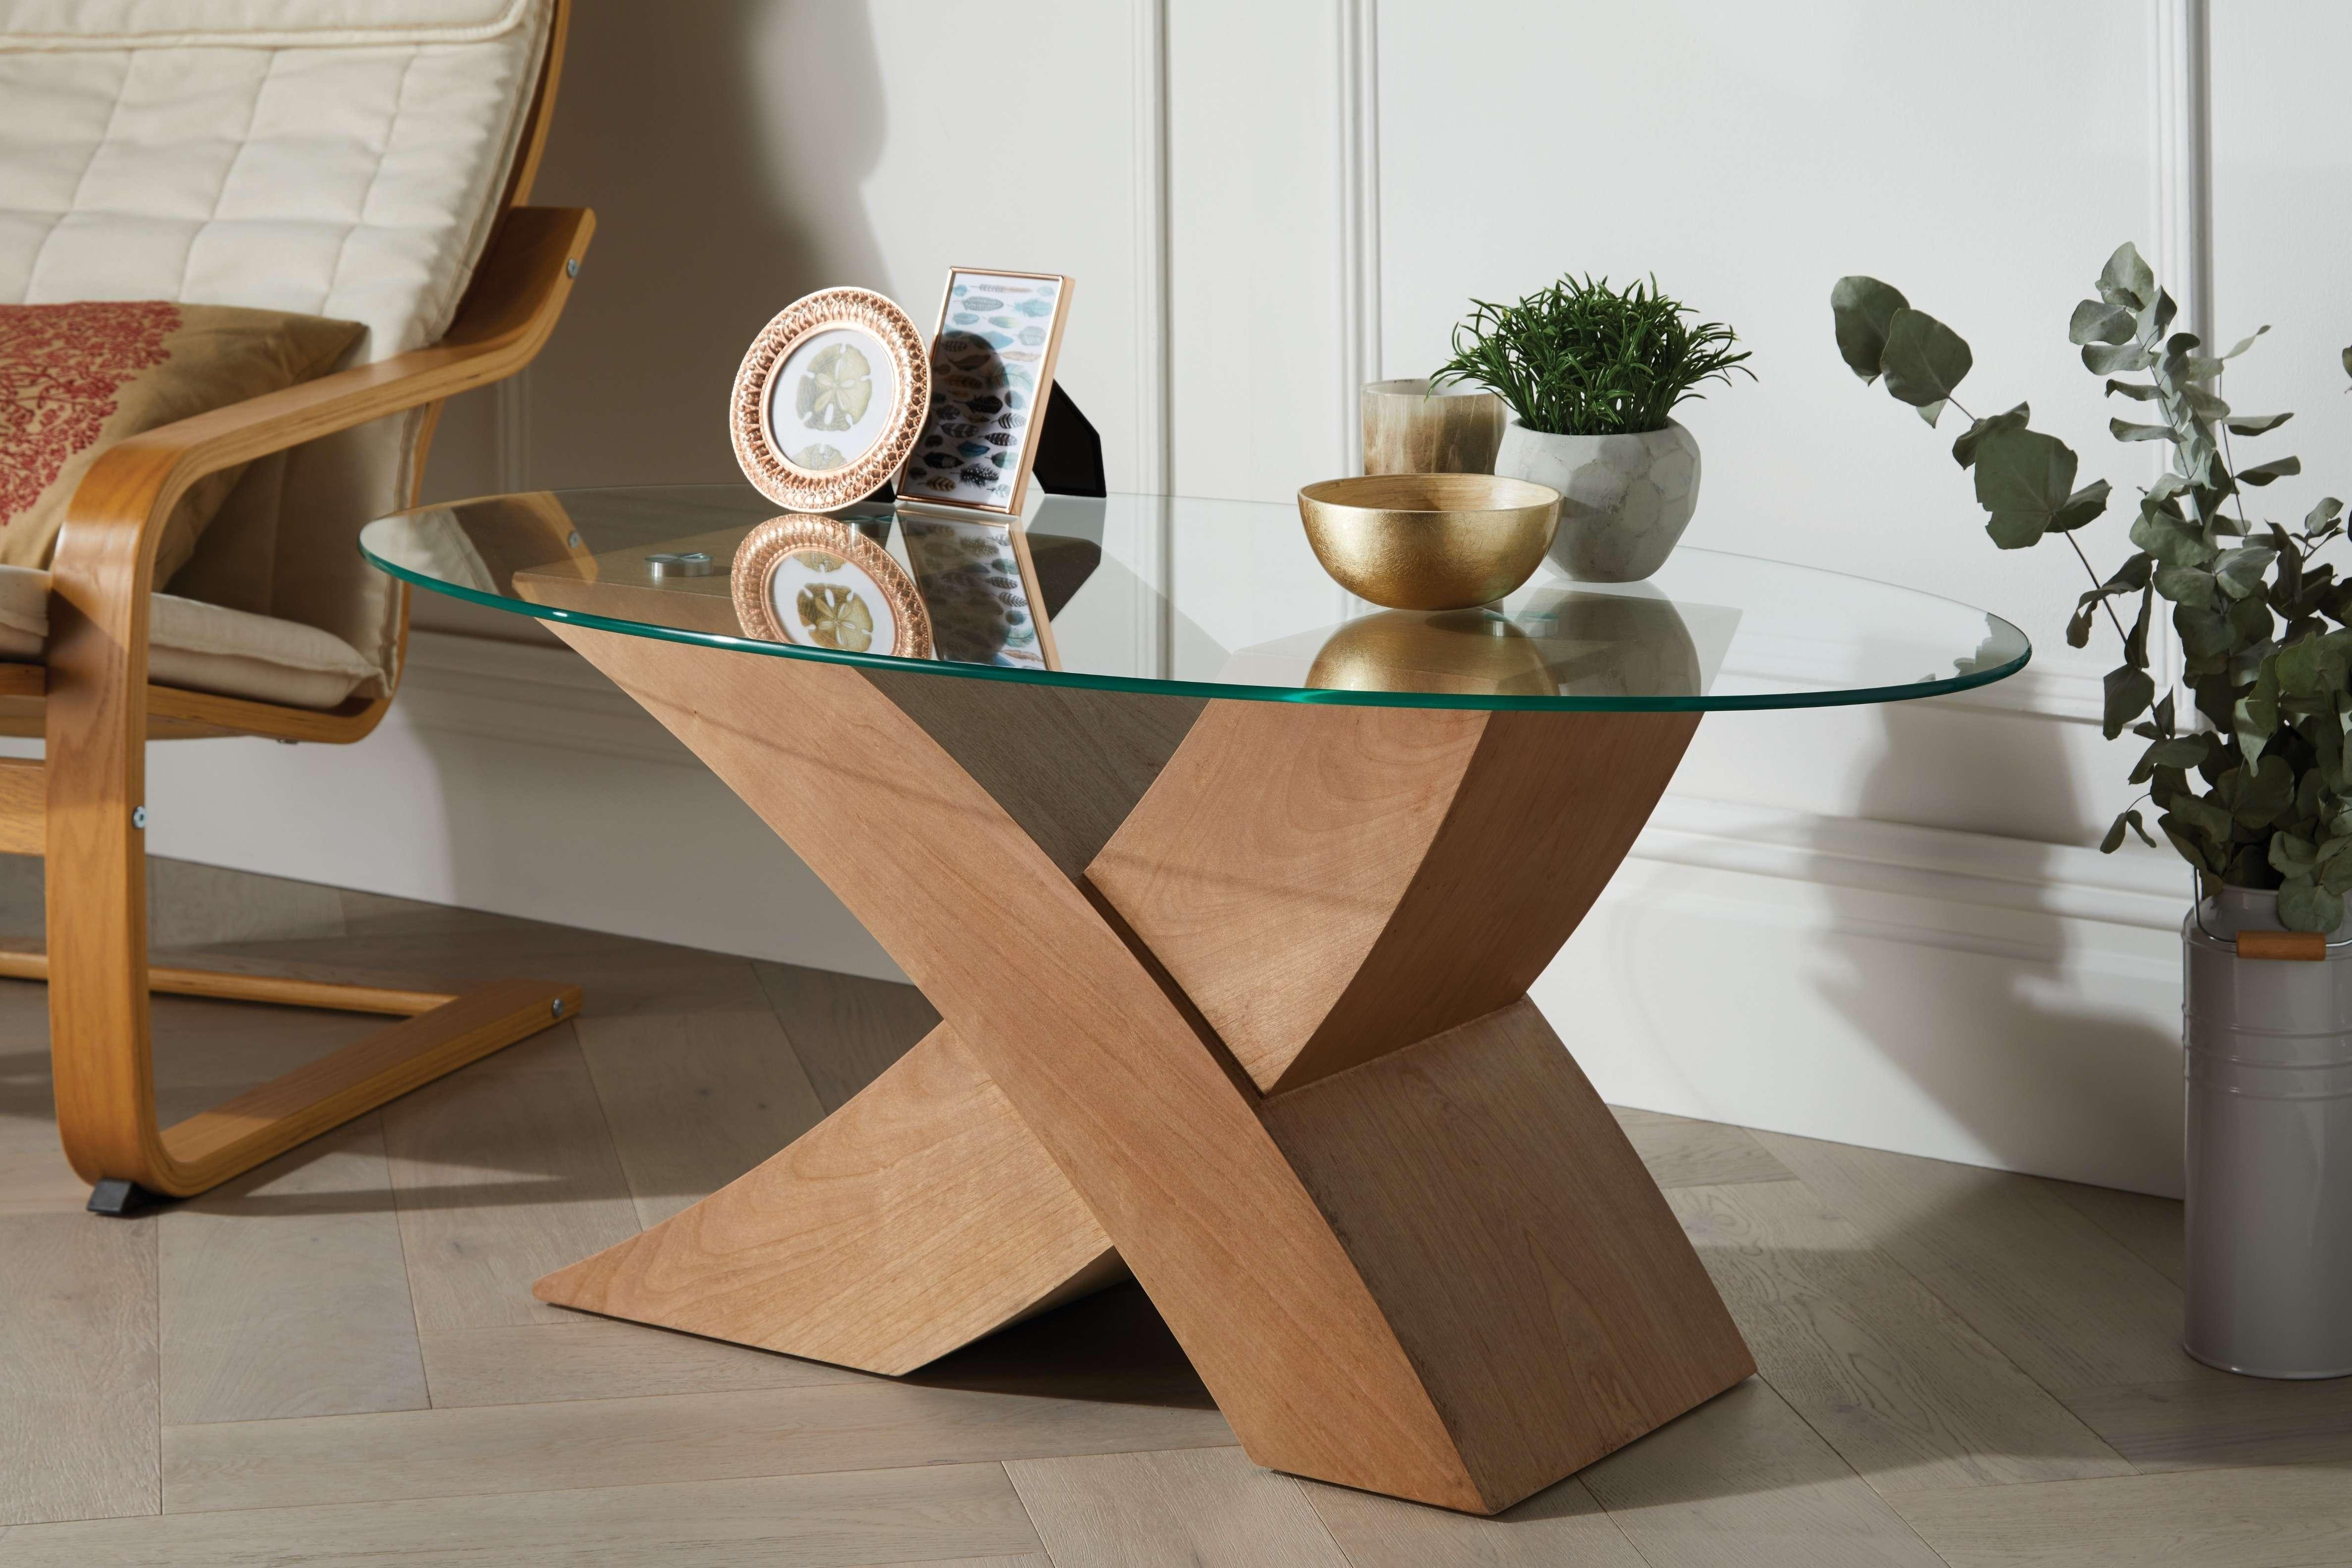 Furniturebox Pertaining To Popular Oak Veneer Coffee Tables (View 8 of 20)